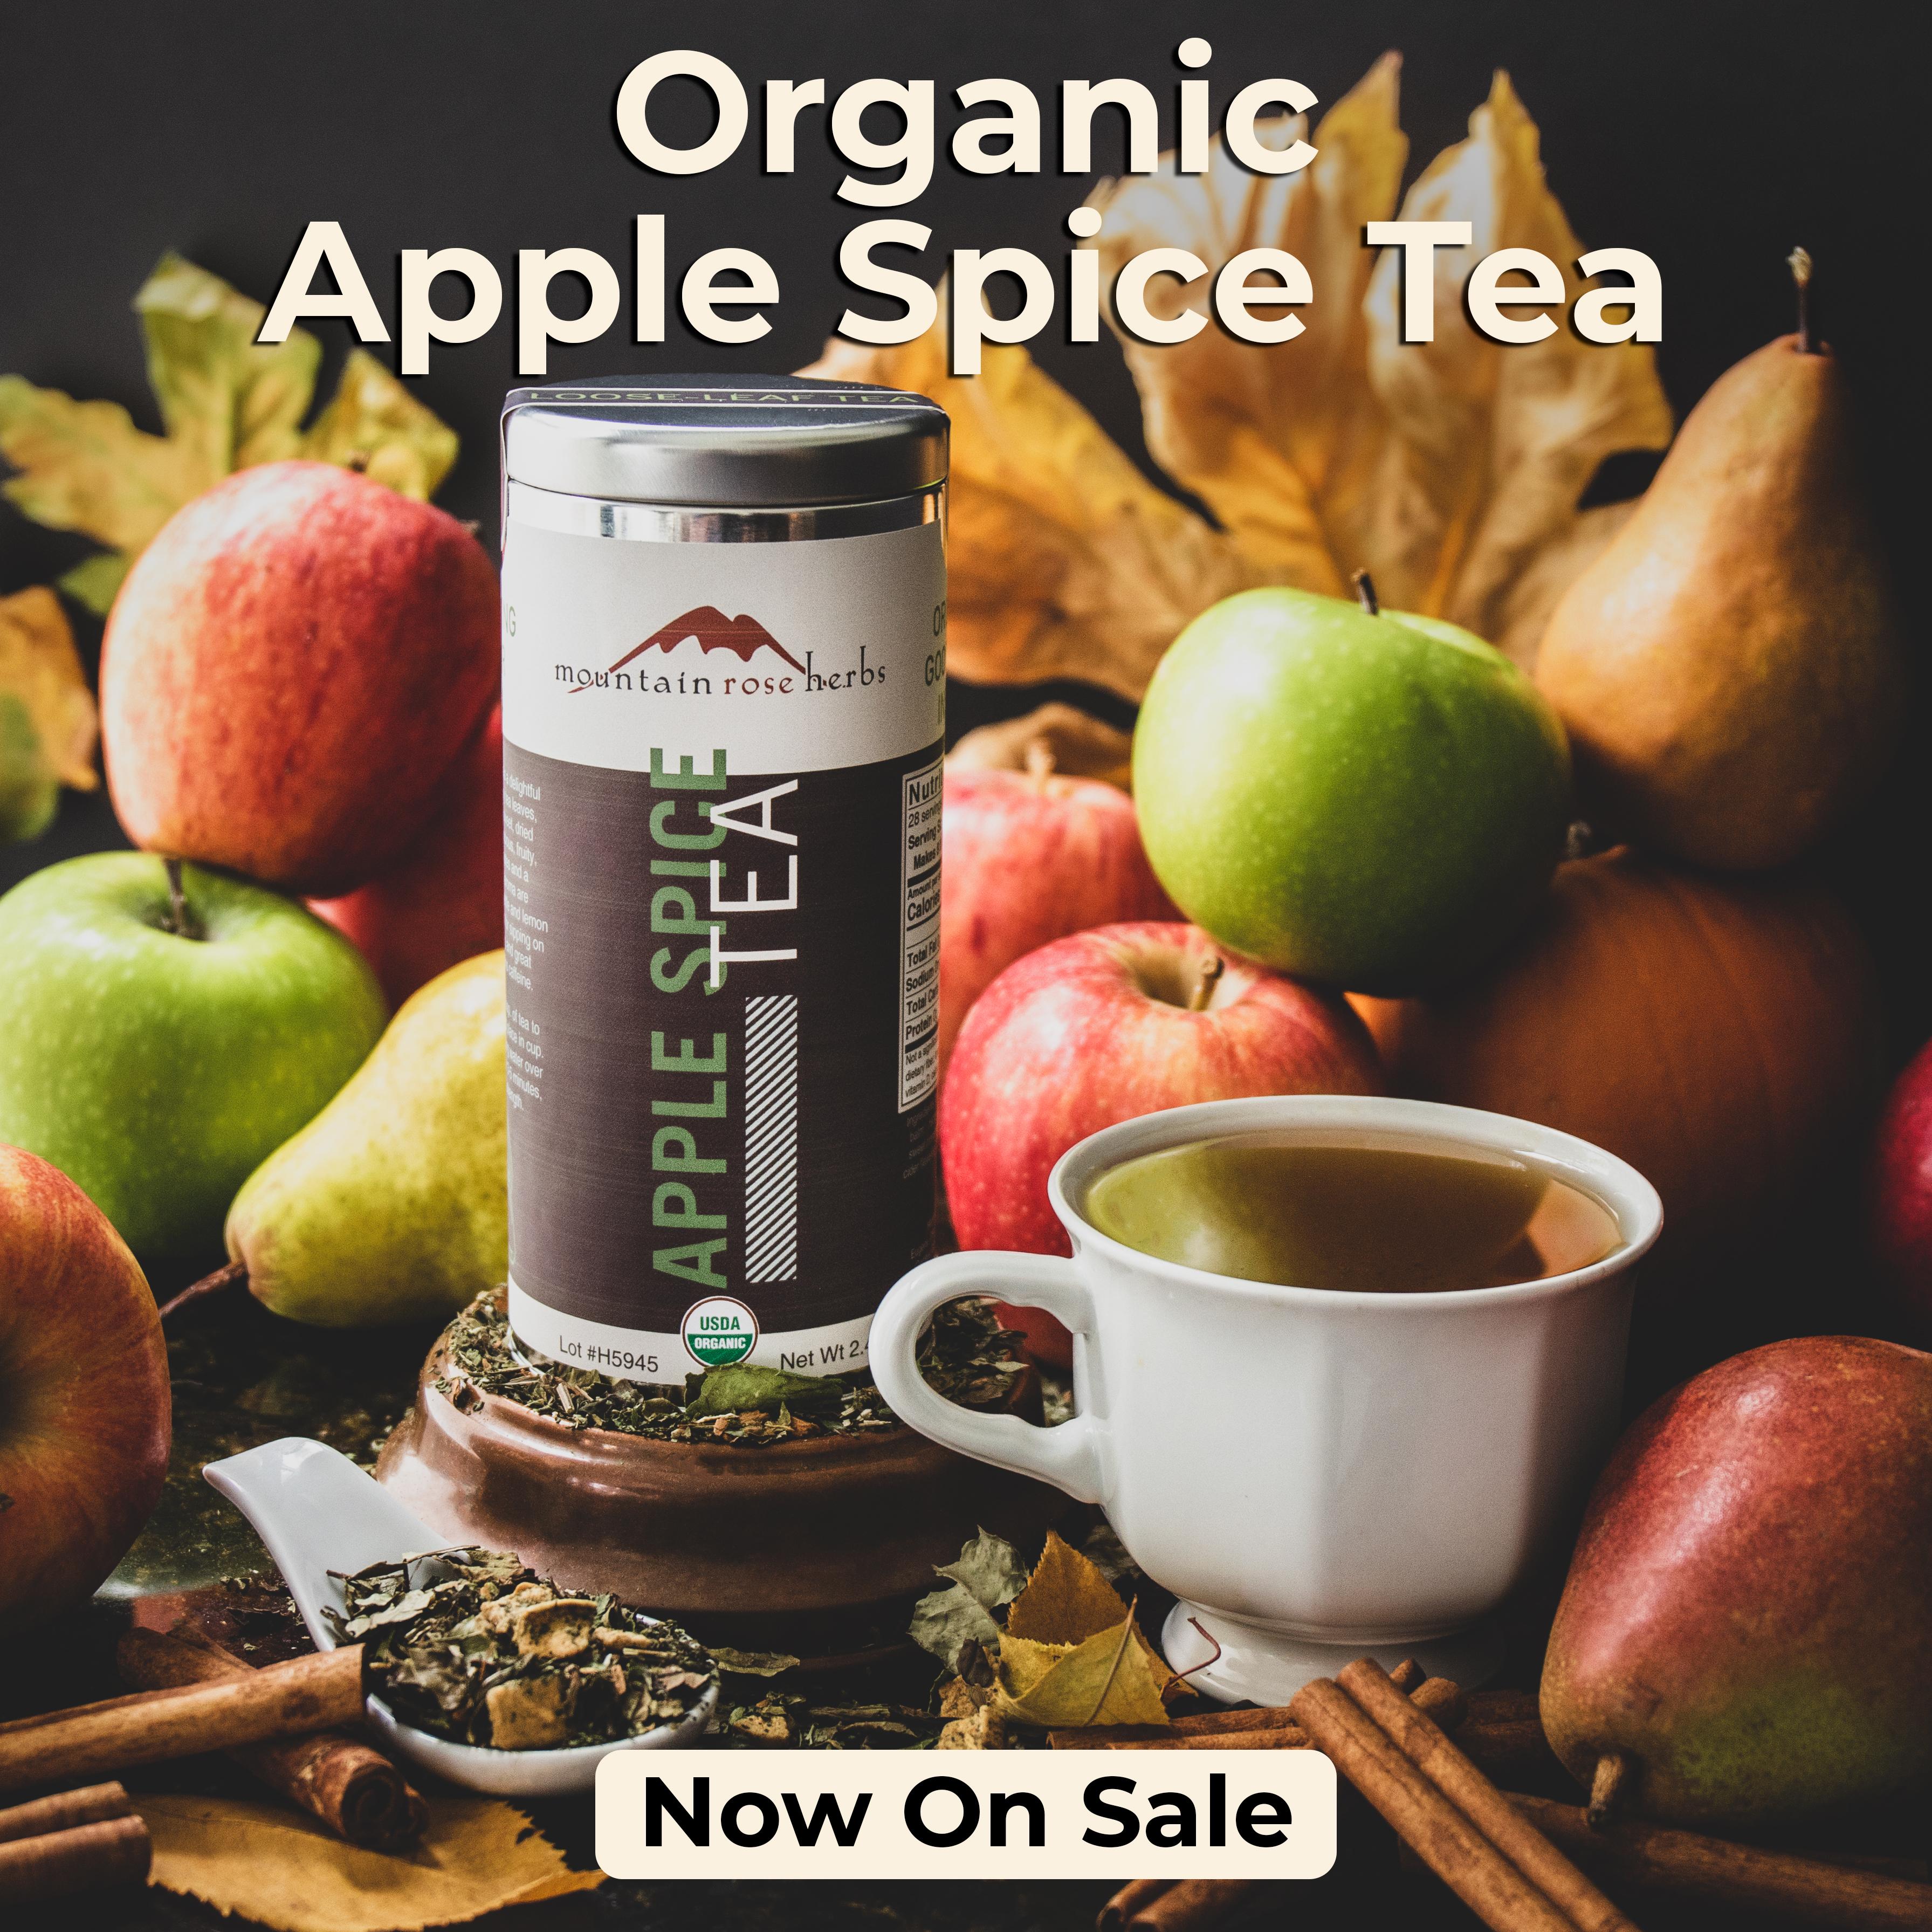 Apple Spice Tea- Now on Sale!